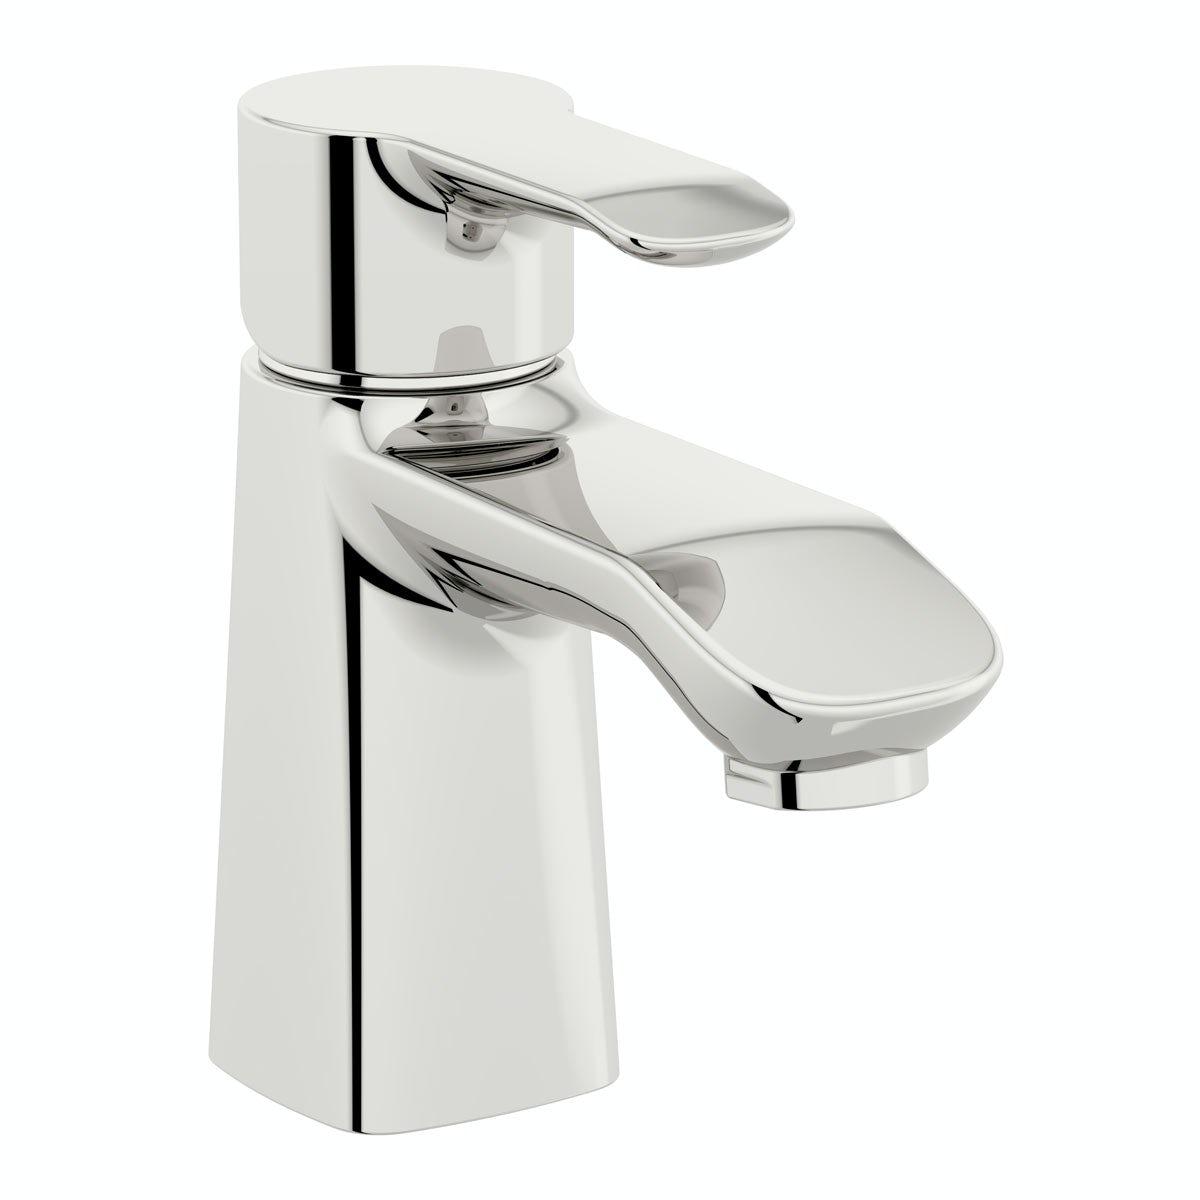 Orchard Wave basin mixer tap